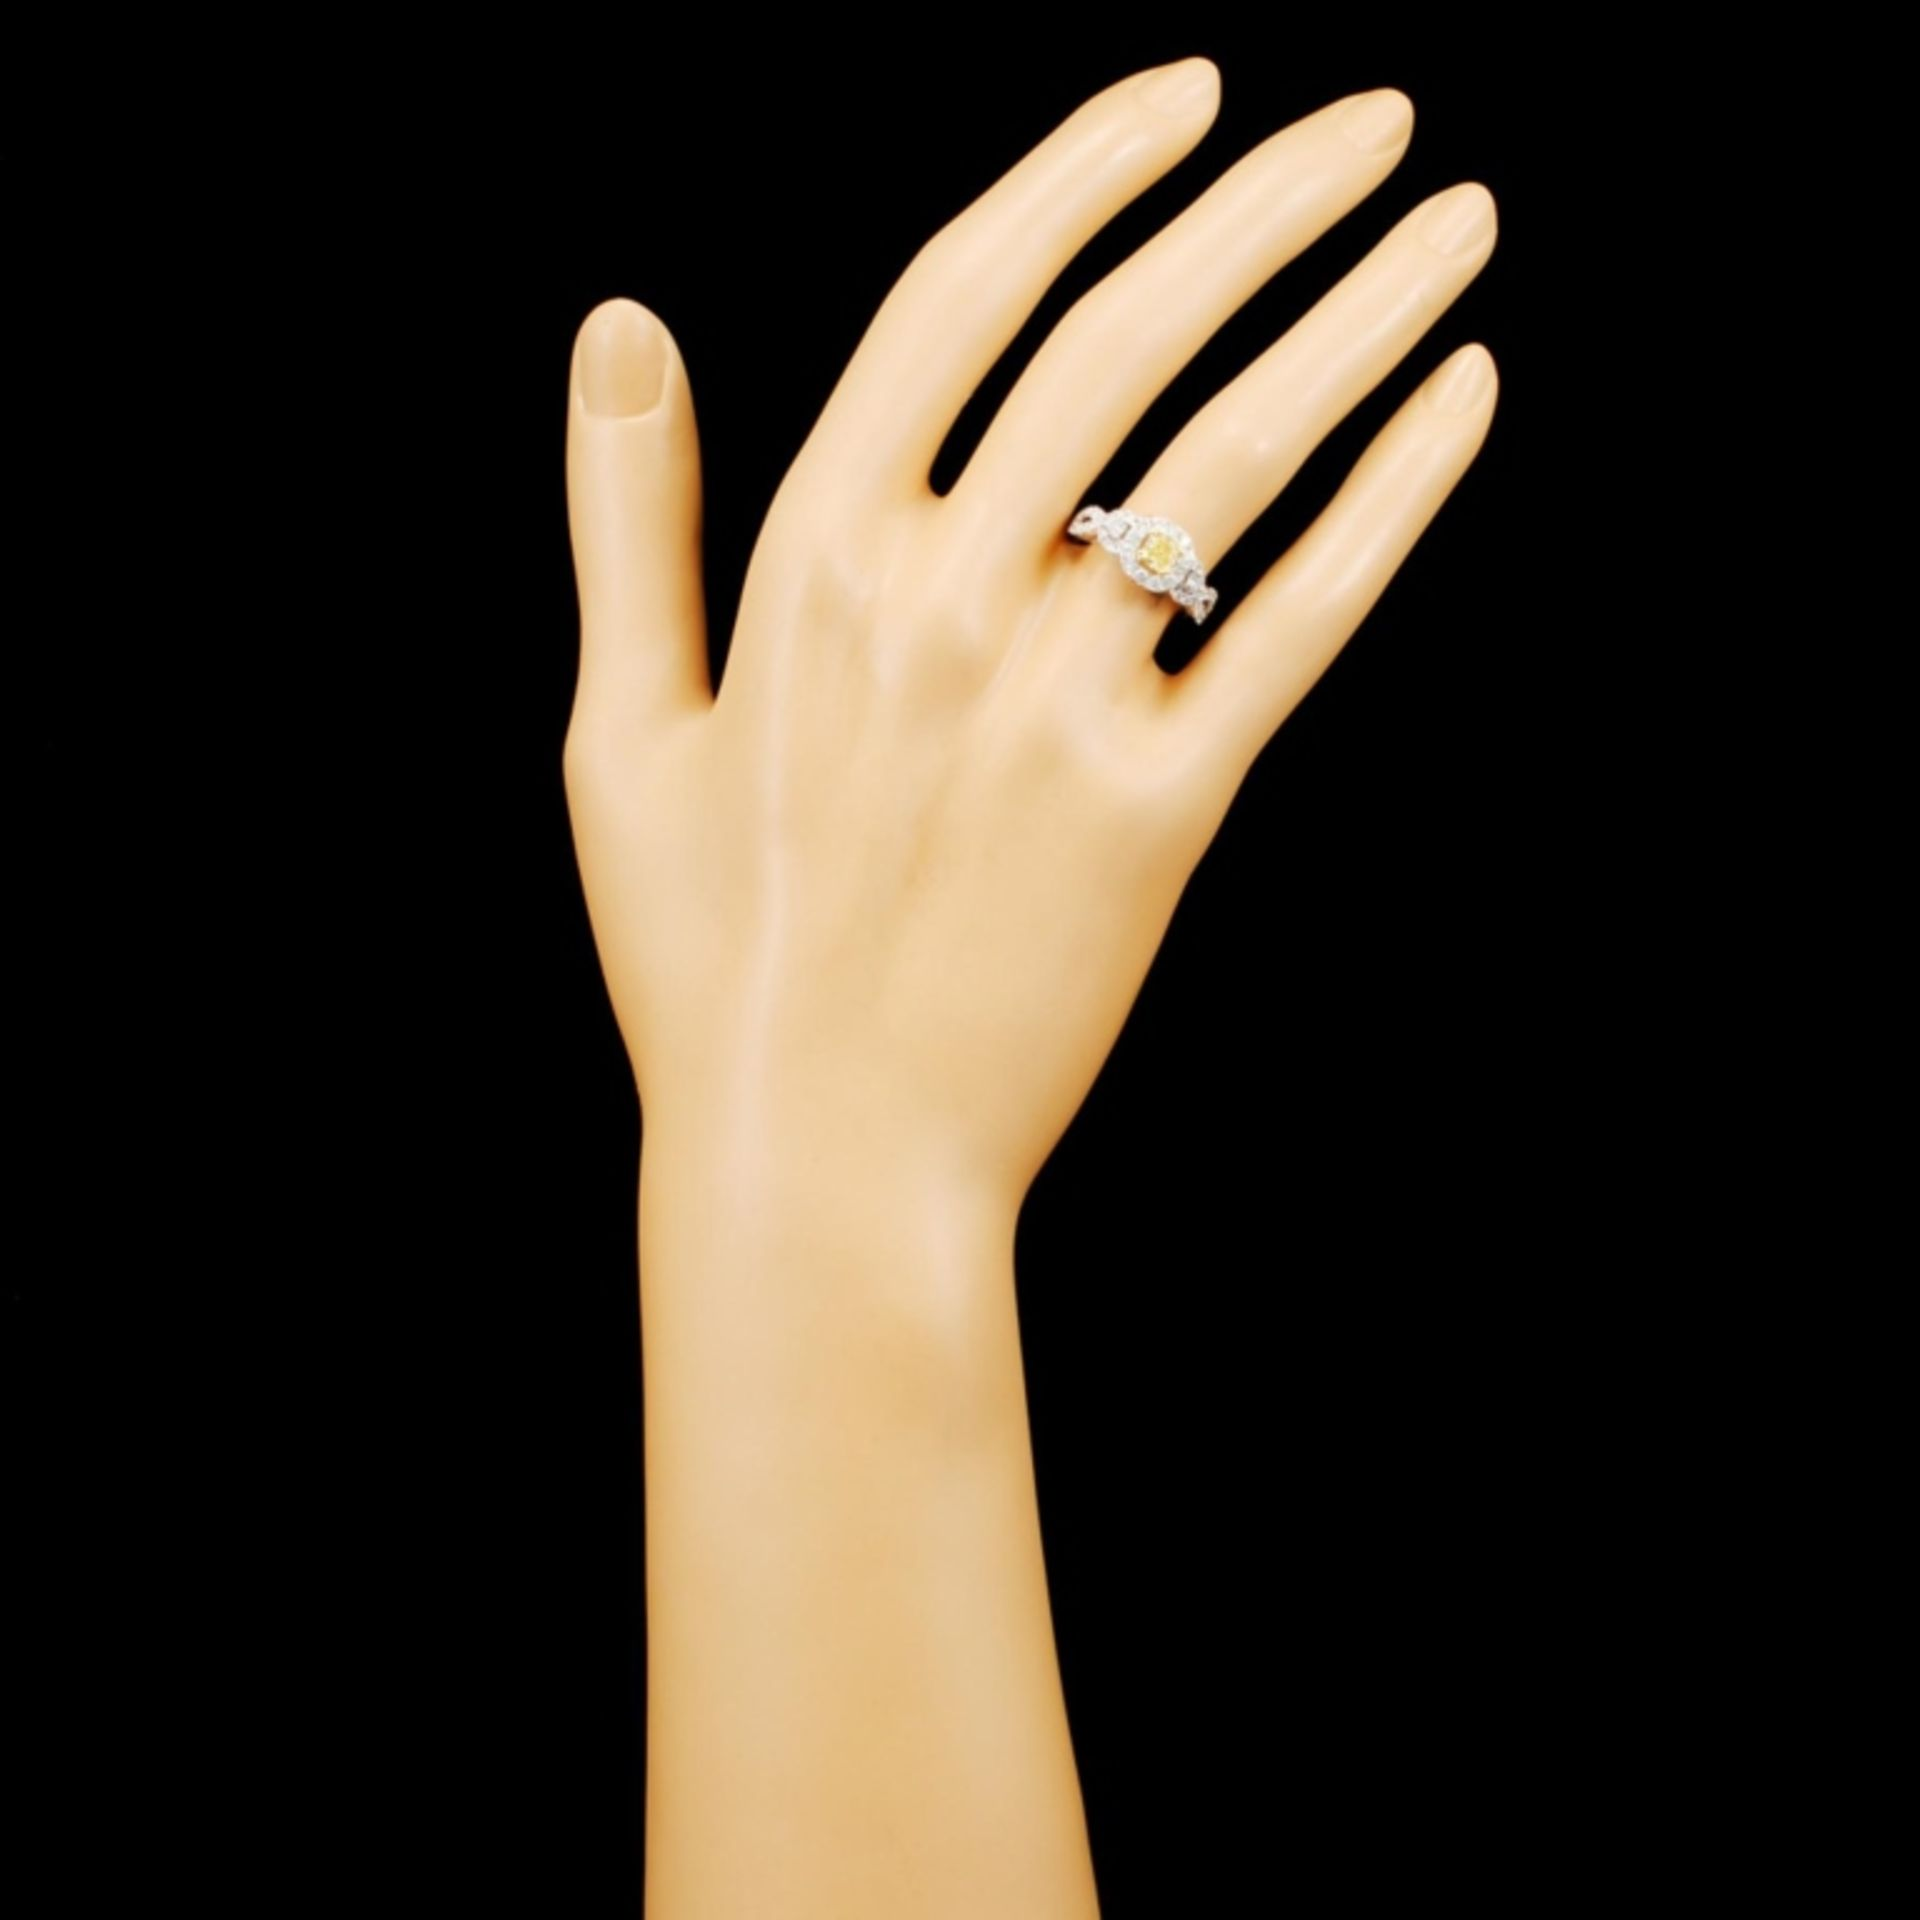 18K Gold 1.31ctw Diamond Ring - Image 4 of 5